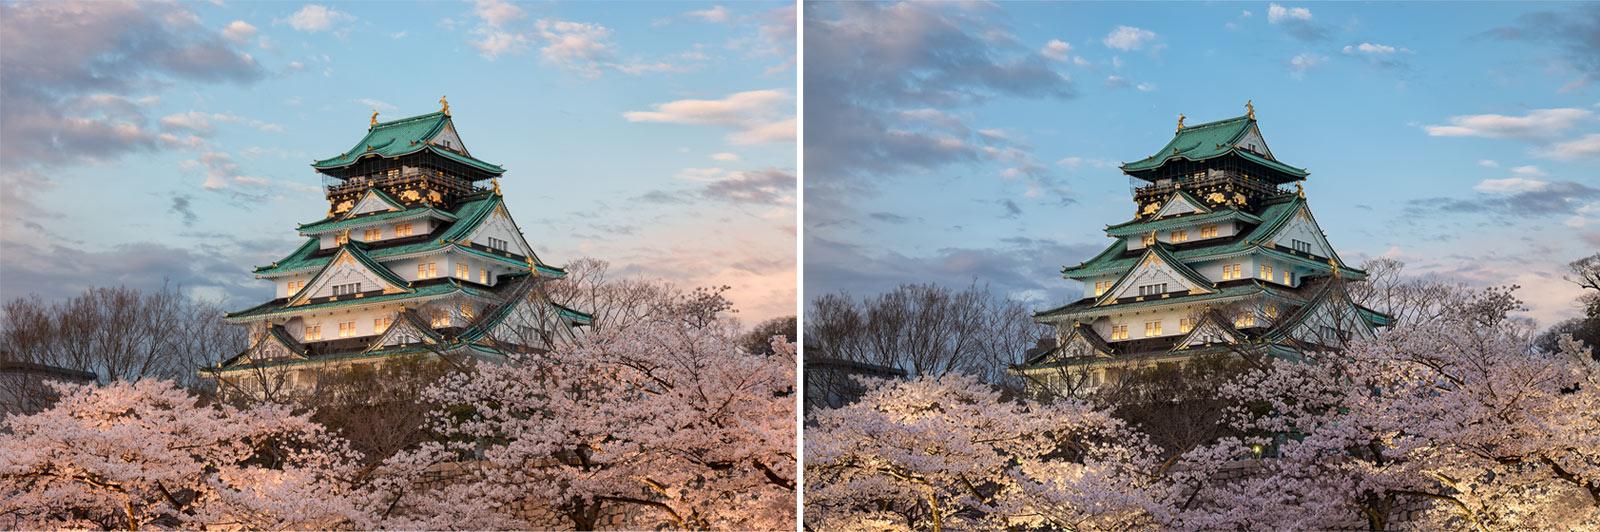 Left: Nikon D800 Image | Right: Fujifilm X-E2 Image